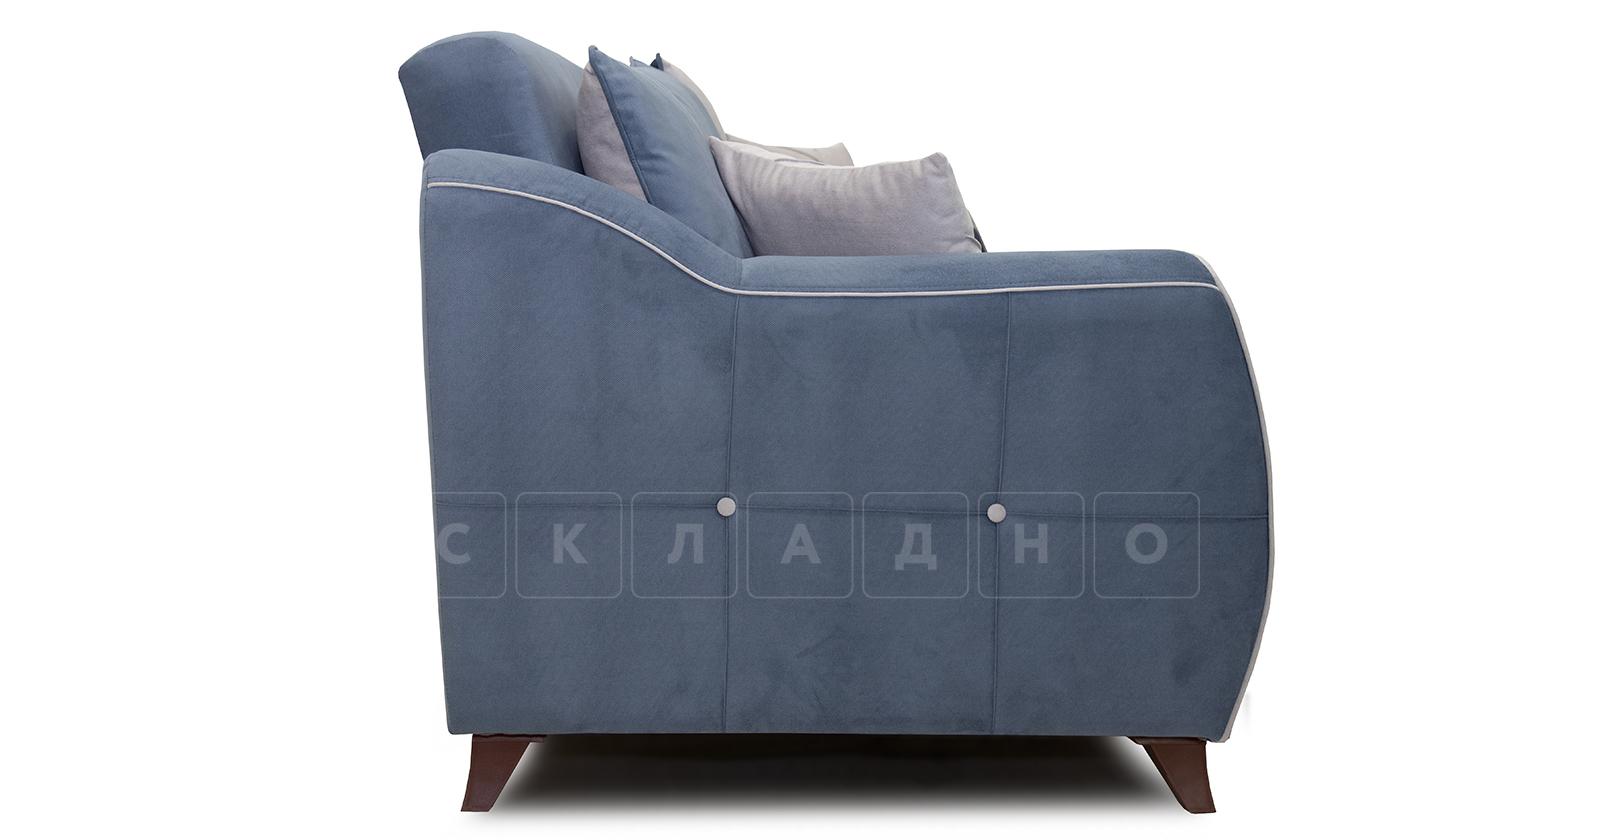 Диван-кровать Флэтфорд серо-синий фото 4 | интернет-магазин Складно